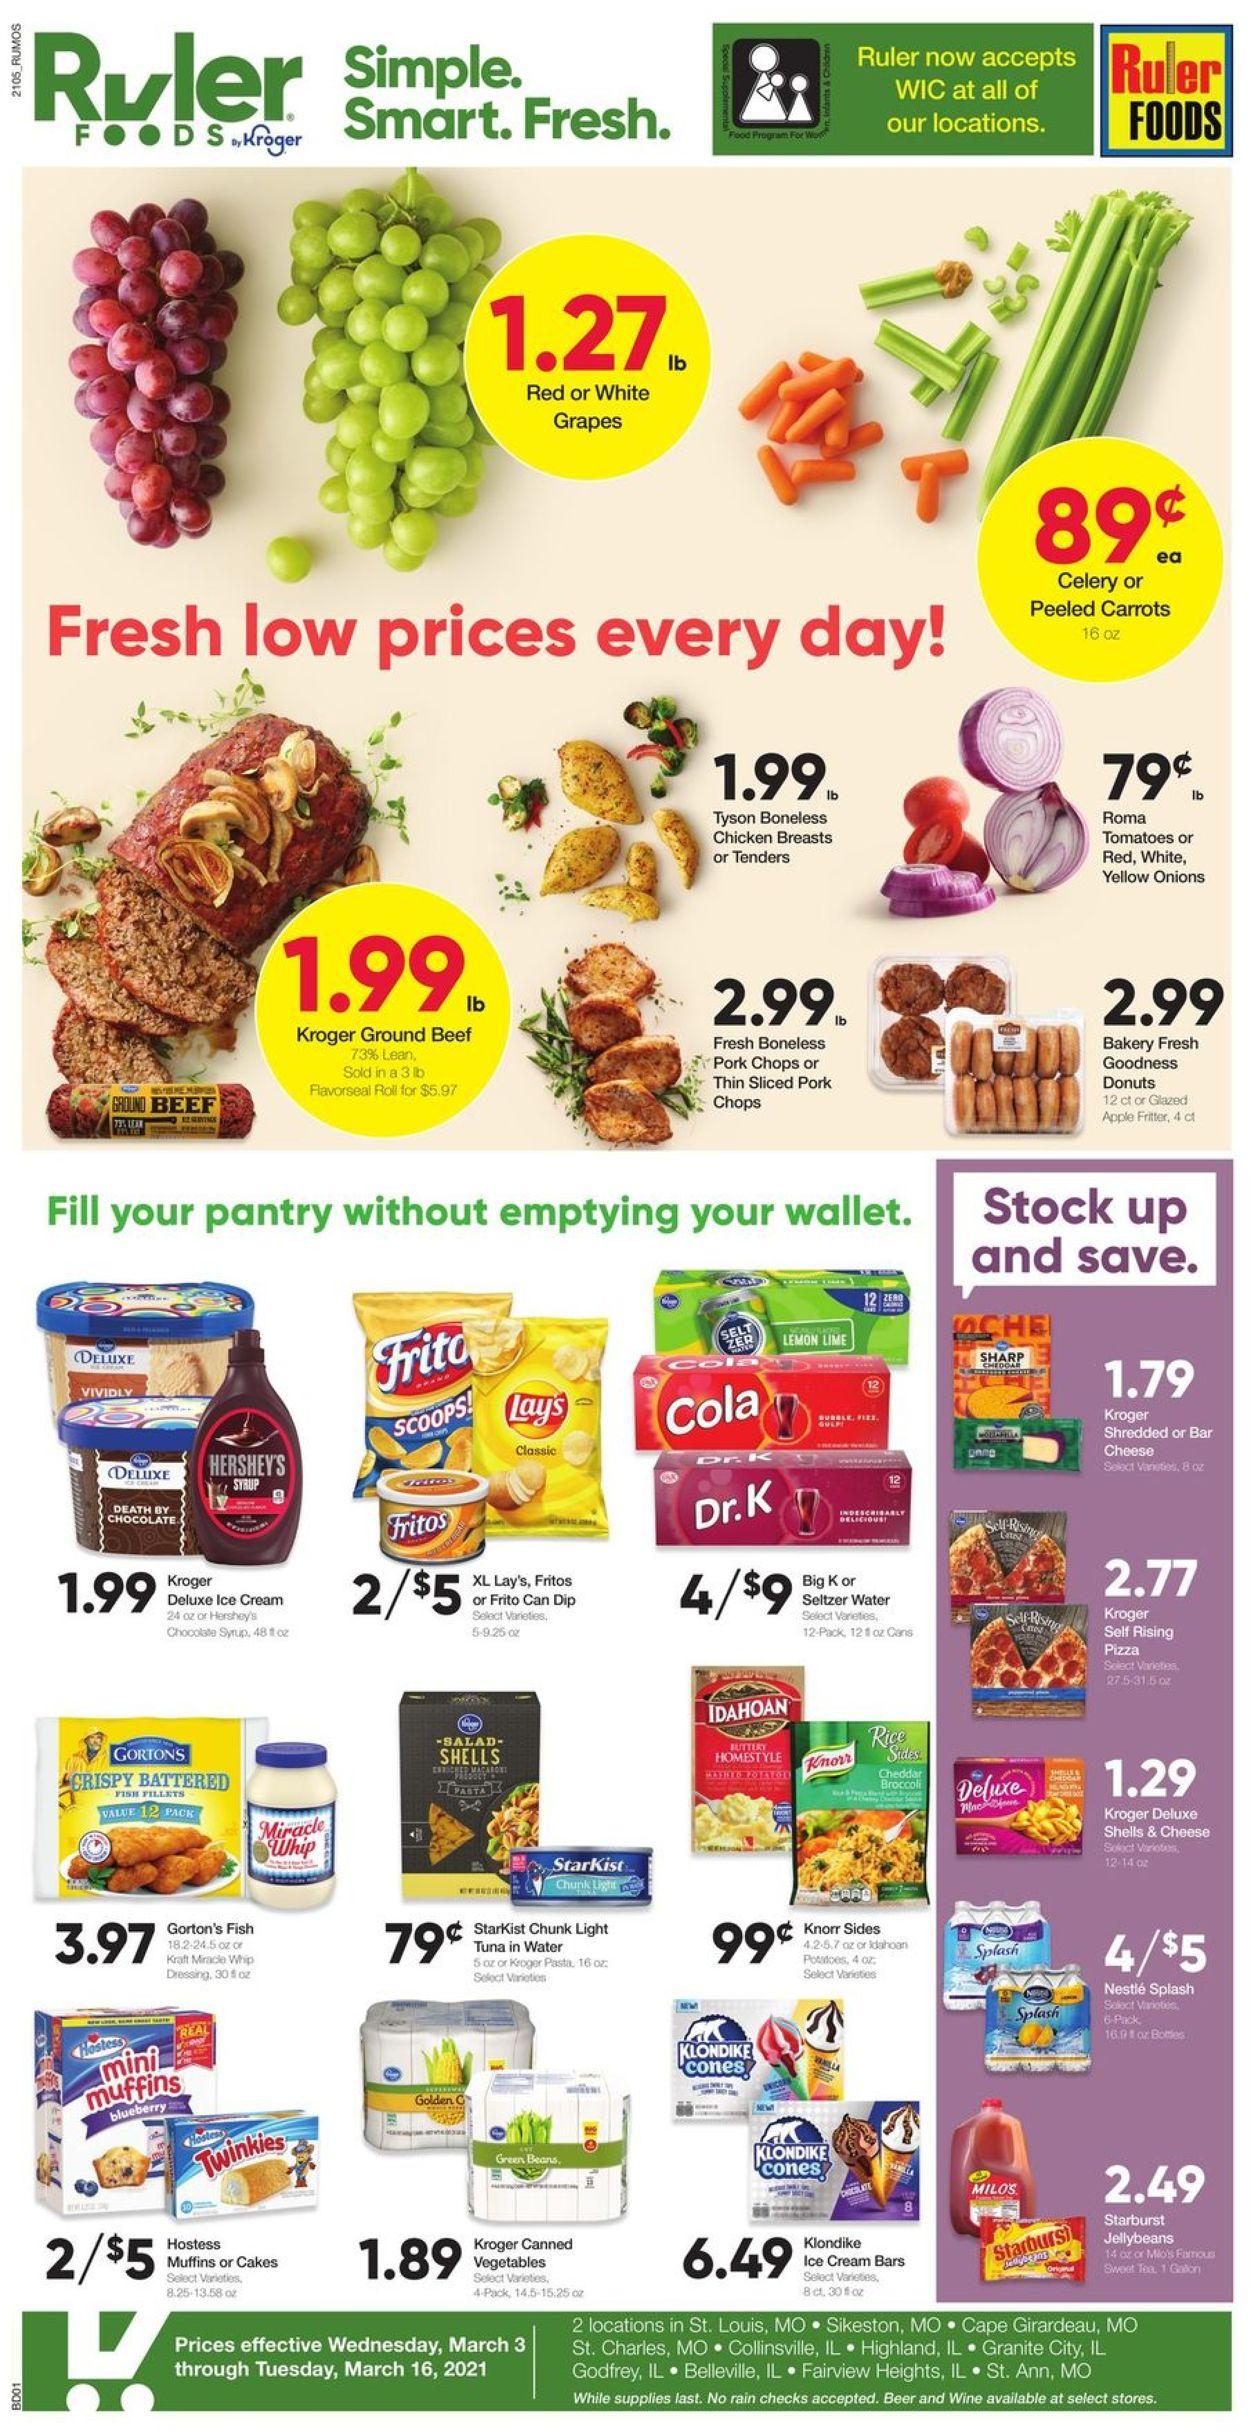 Ruler Foods Weekly Ad Circular - valid 03/03-03/16/2021